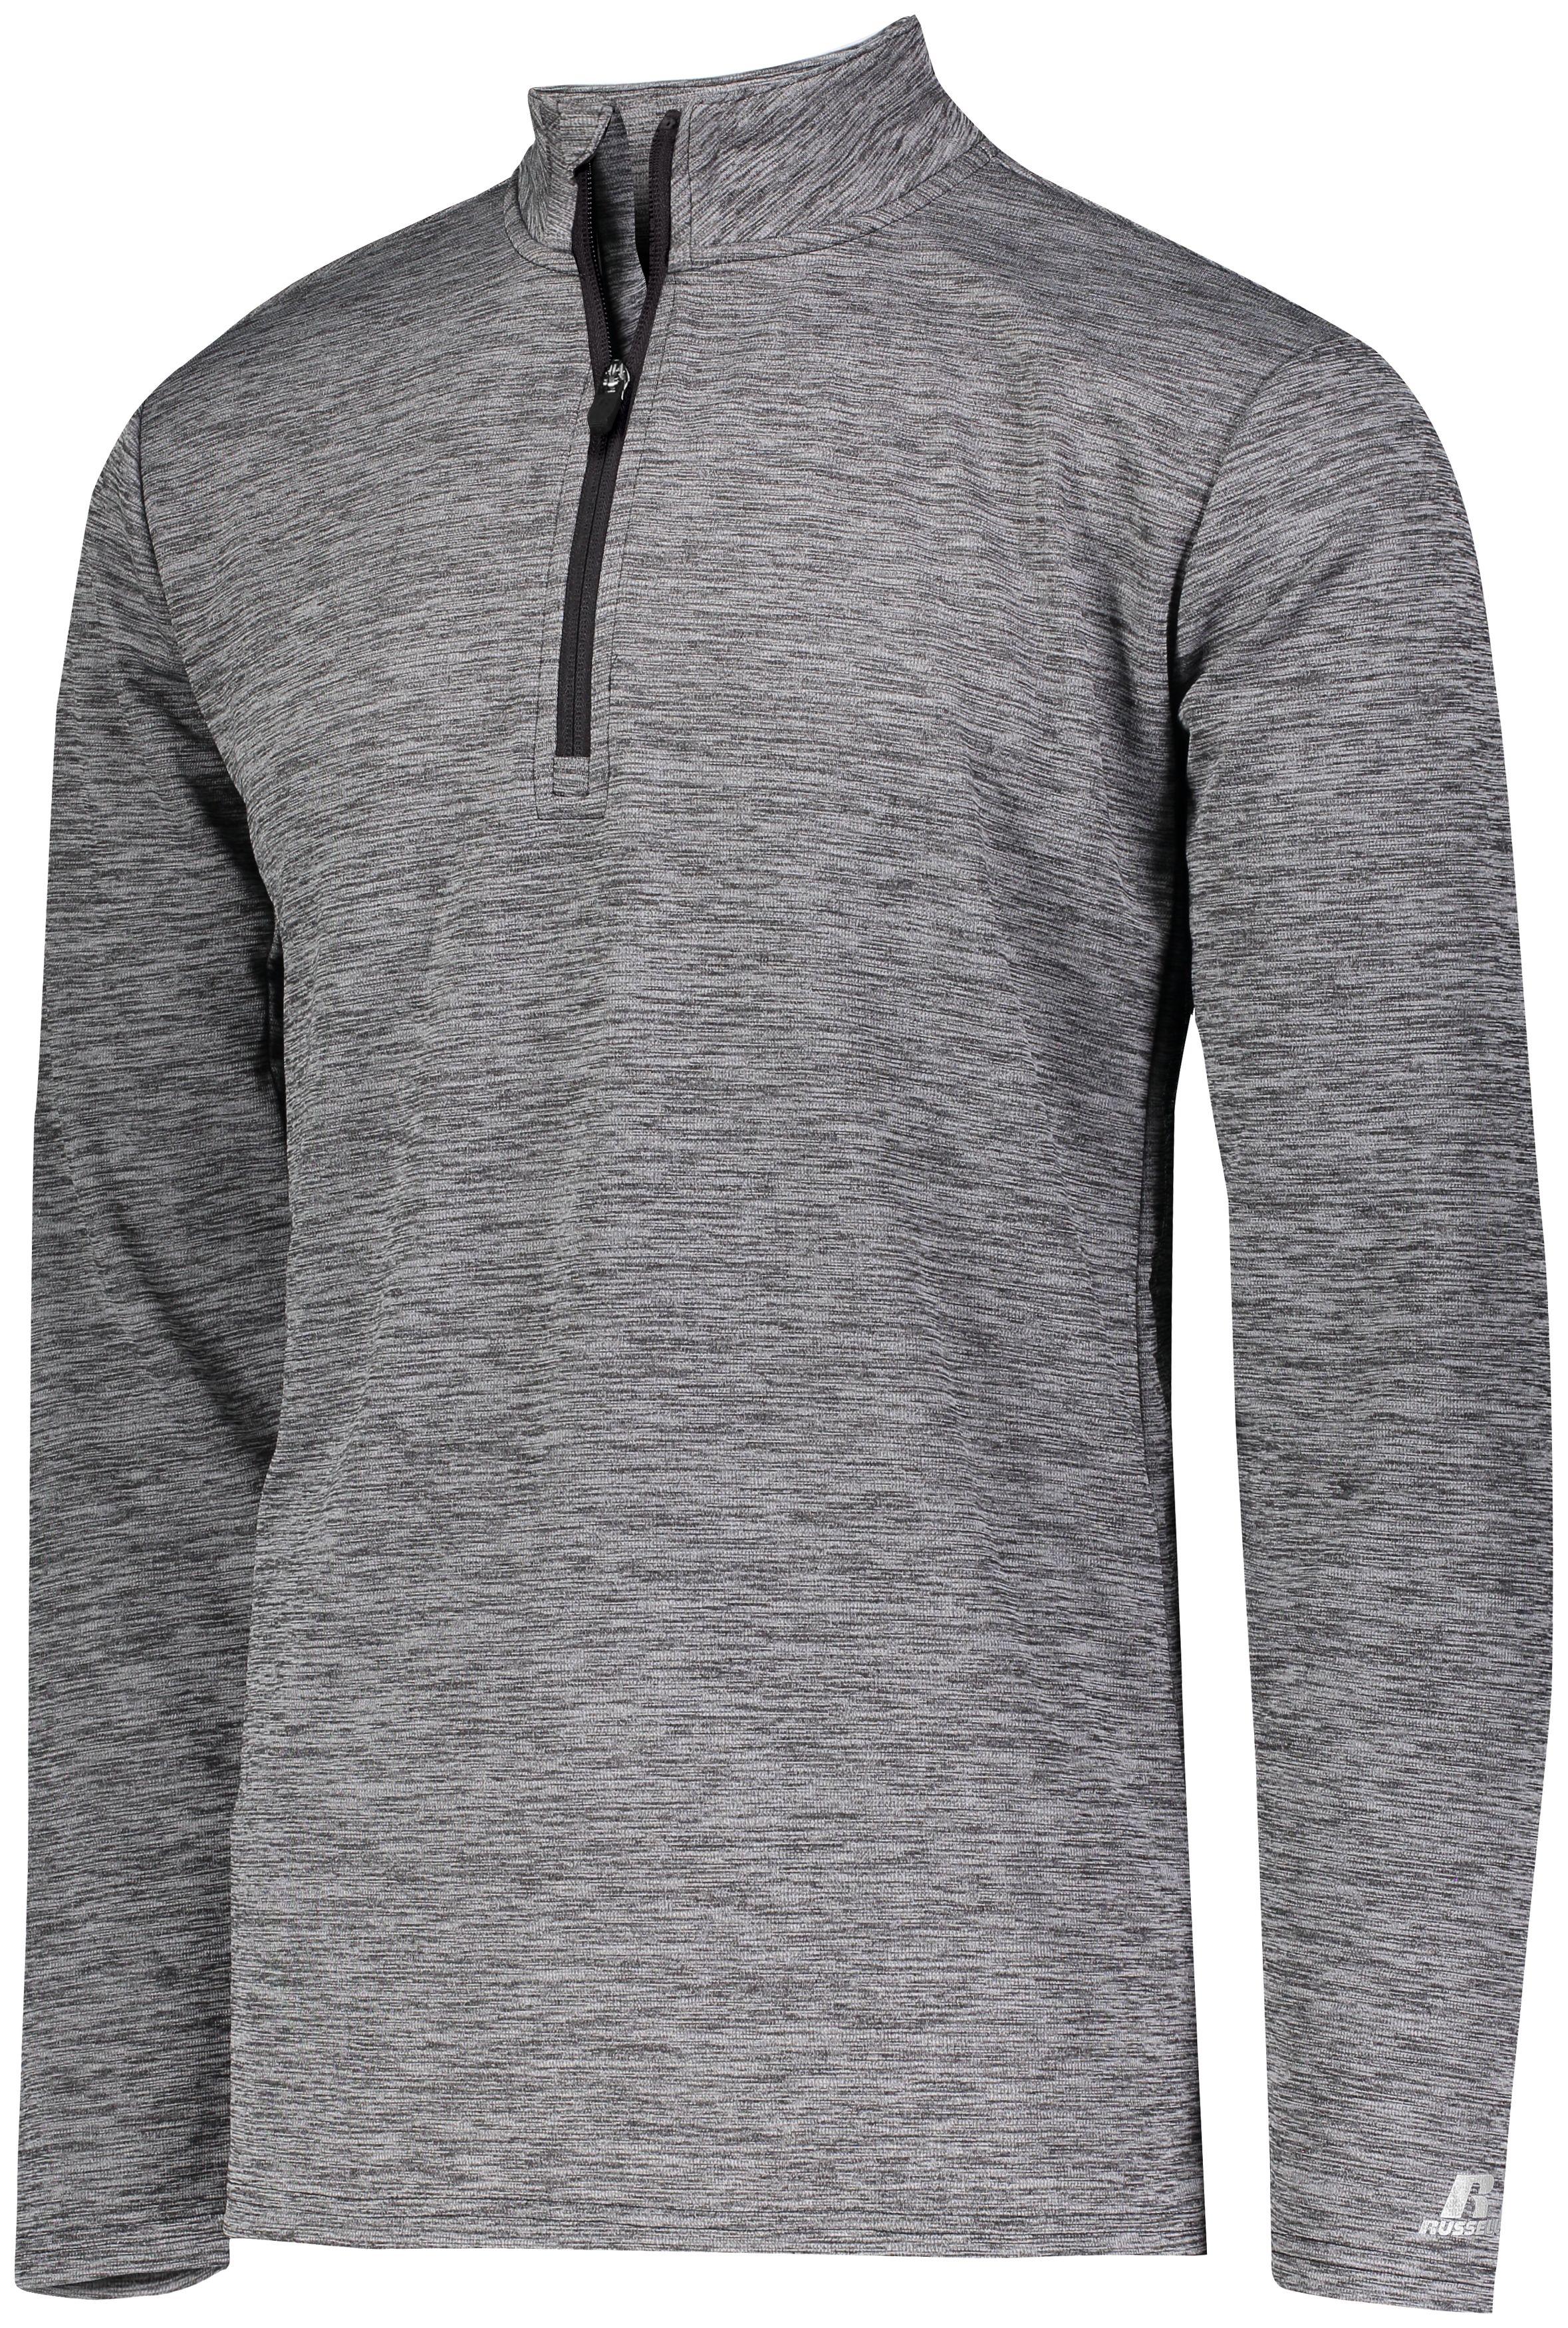 Dri-Power Lightweight 1/4 Zip Pullover - Black